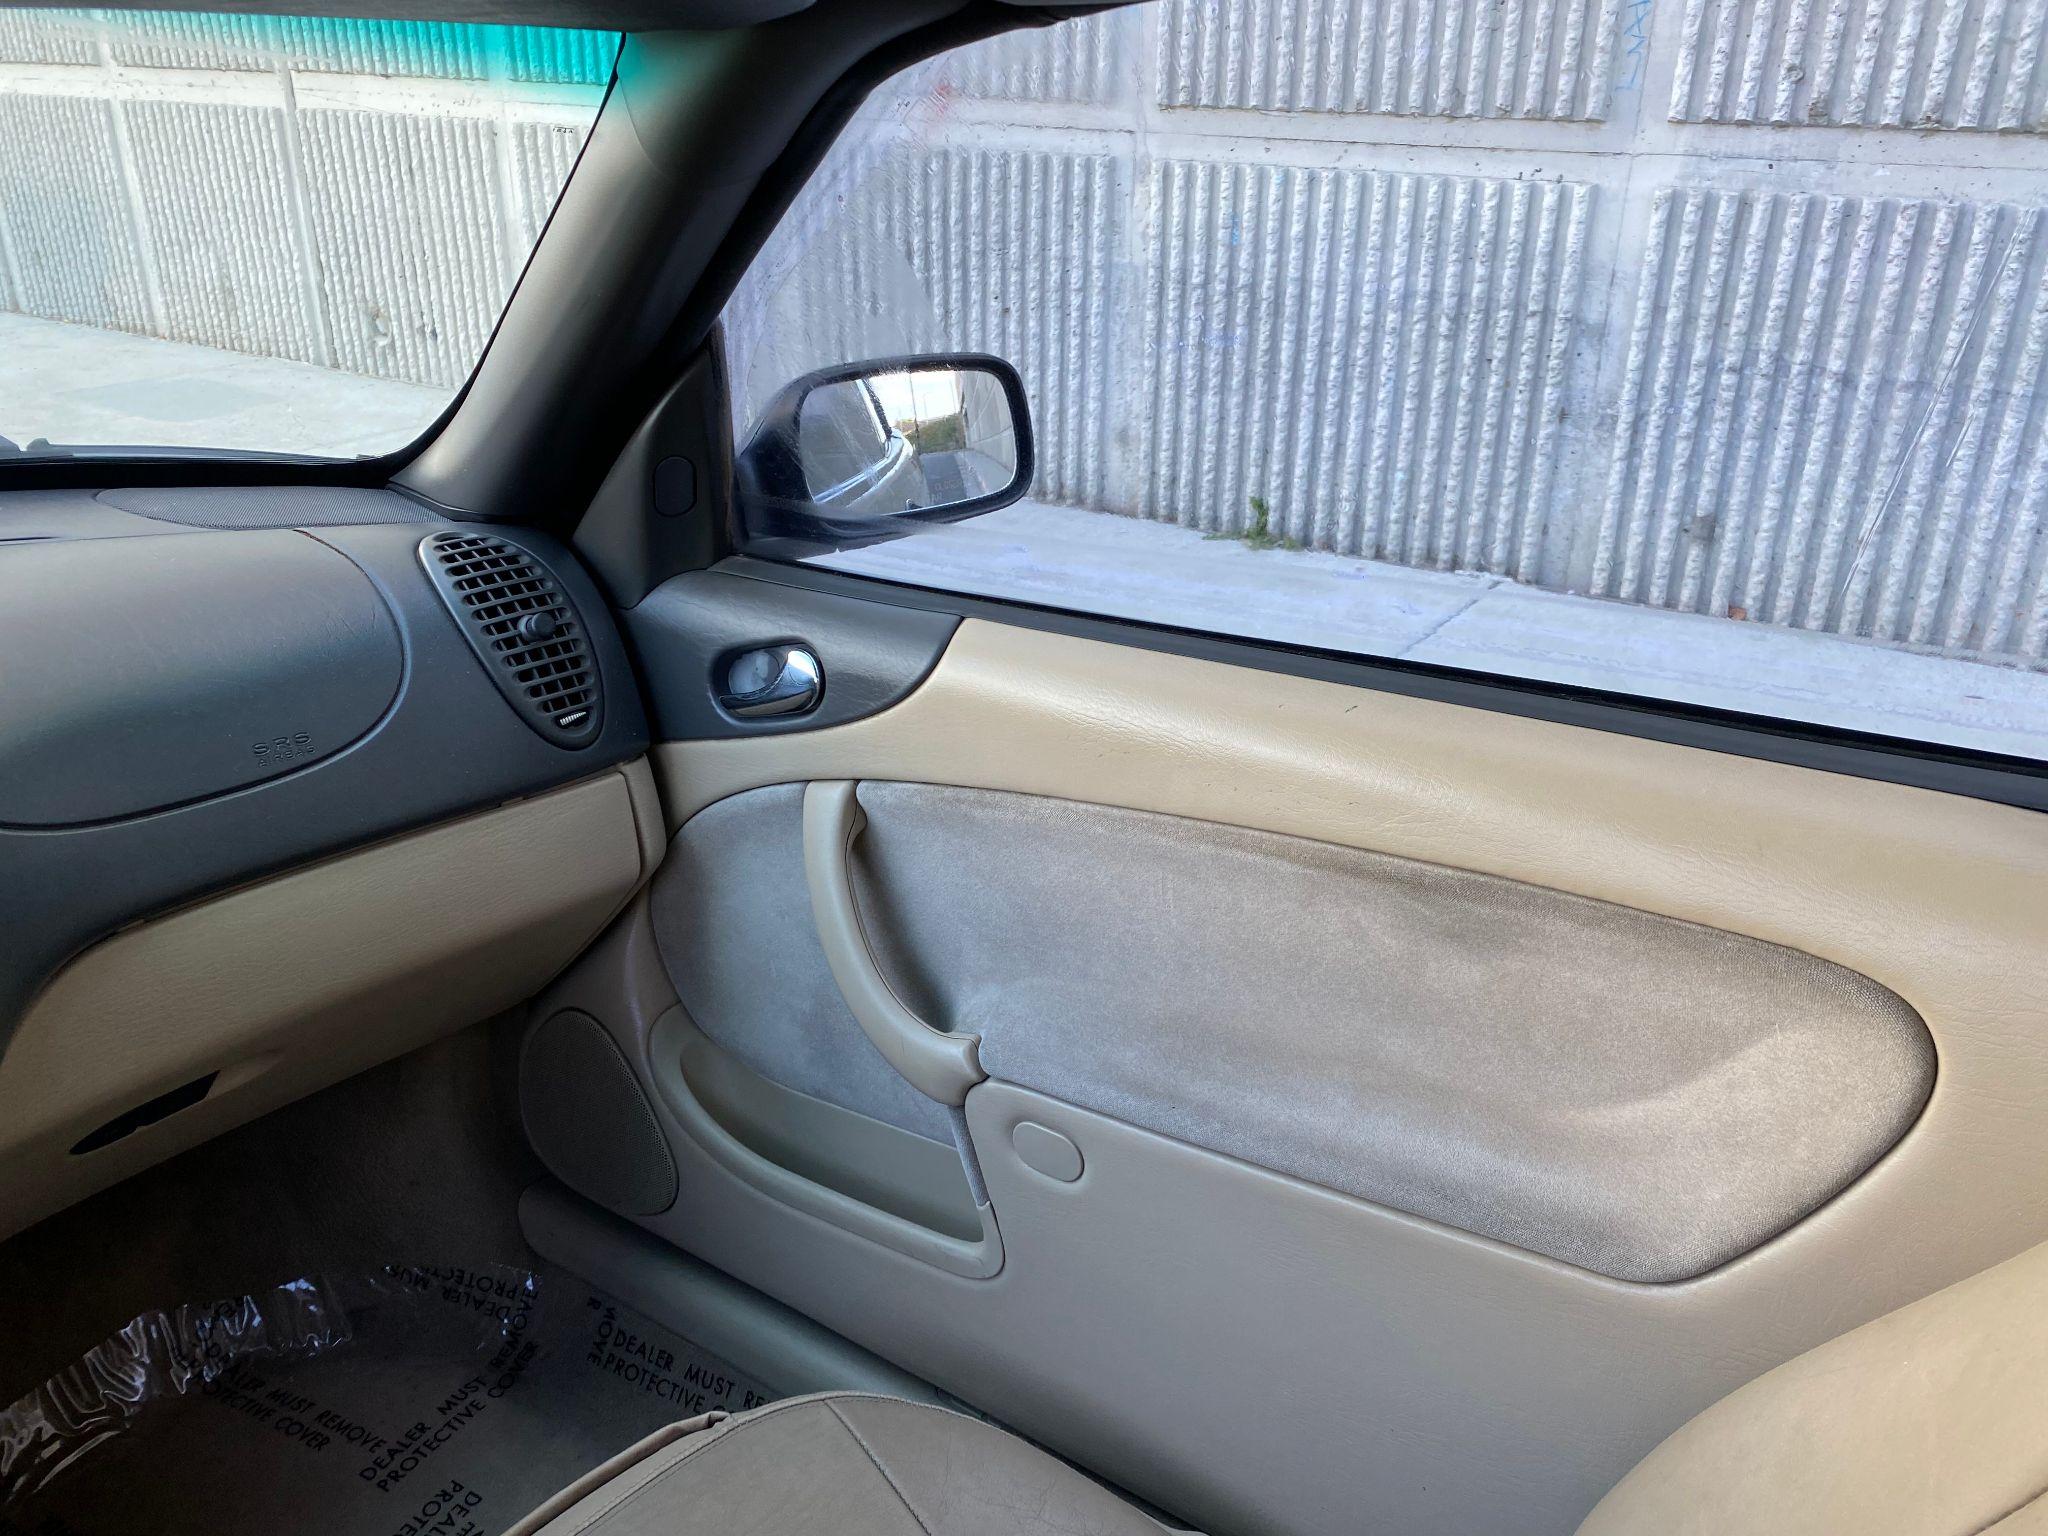 2000 Saab 9-3 SE Spring Edition